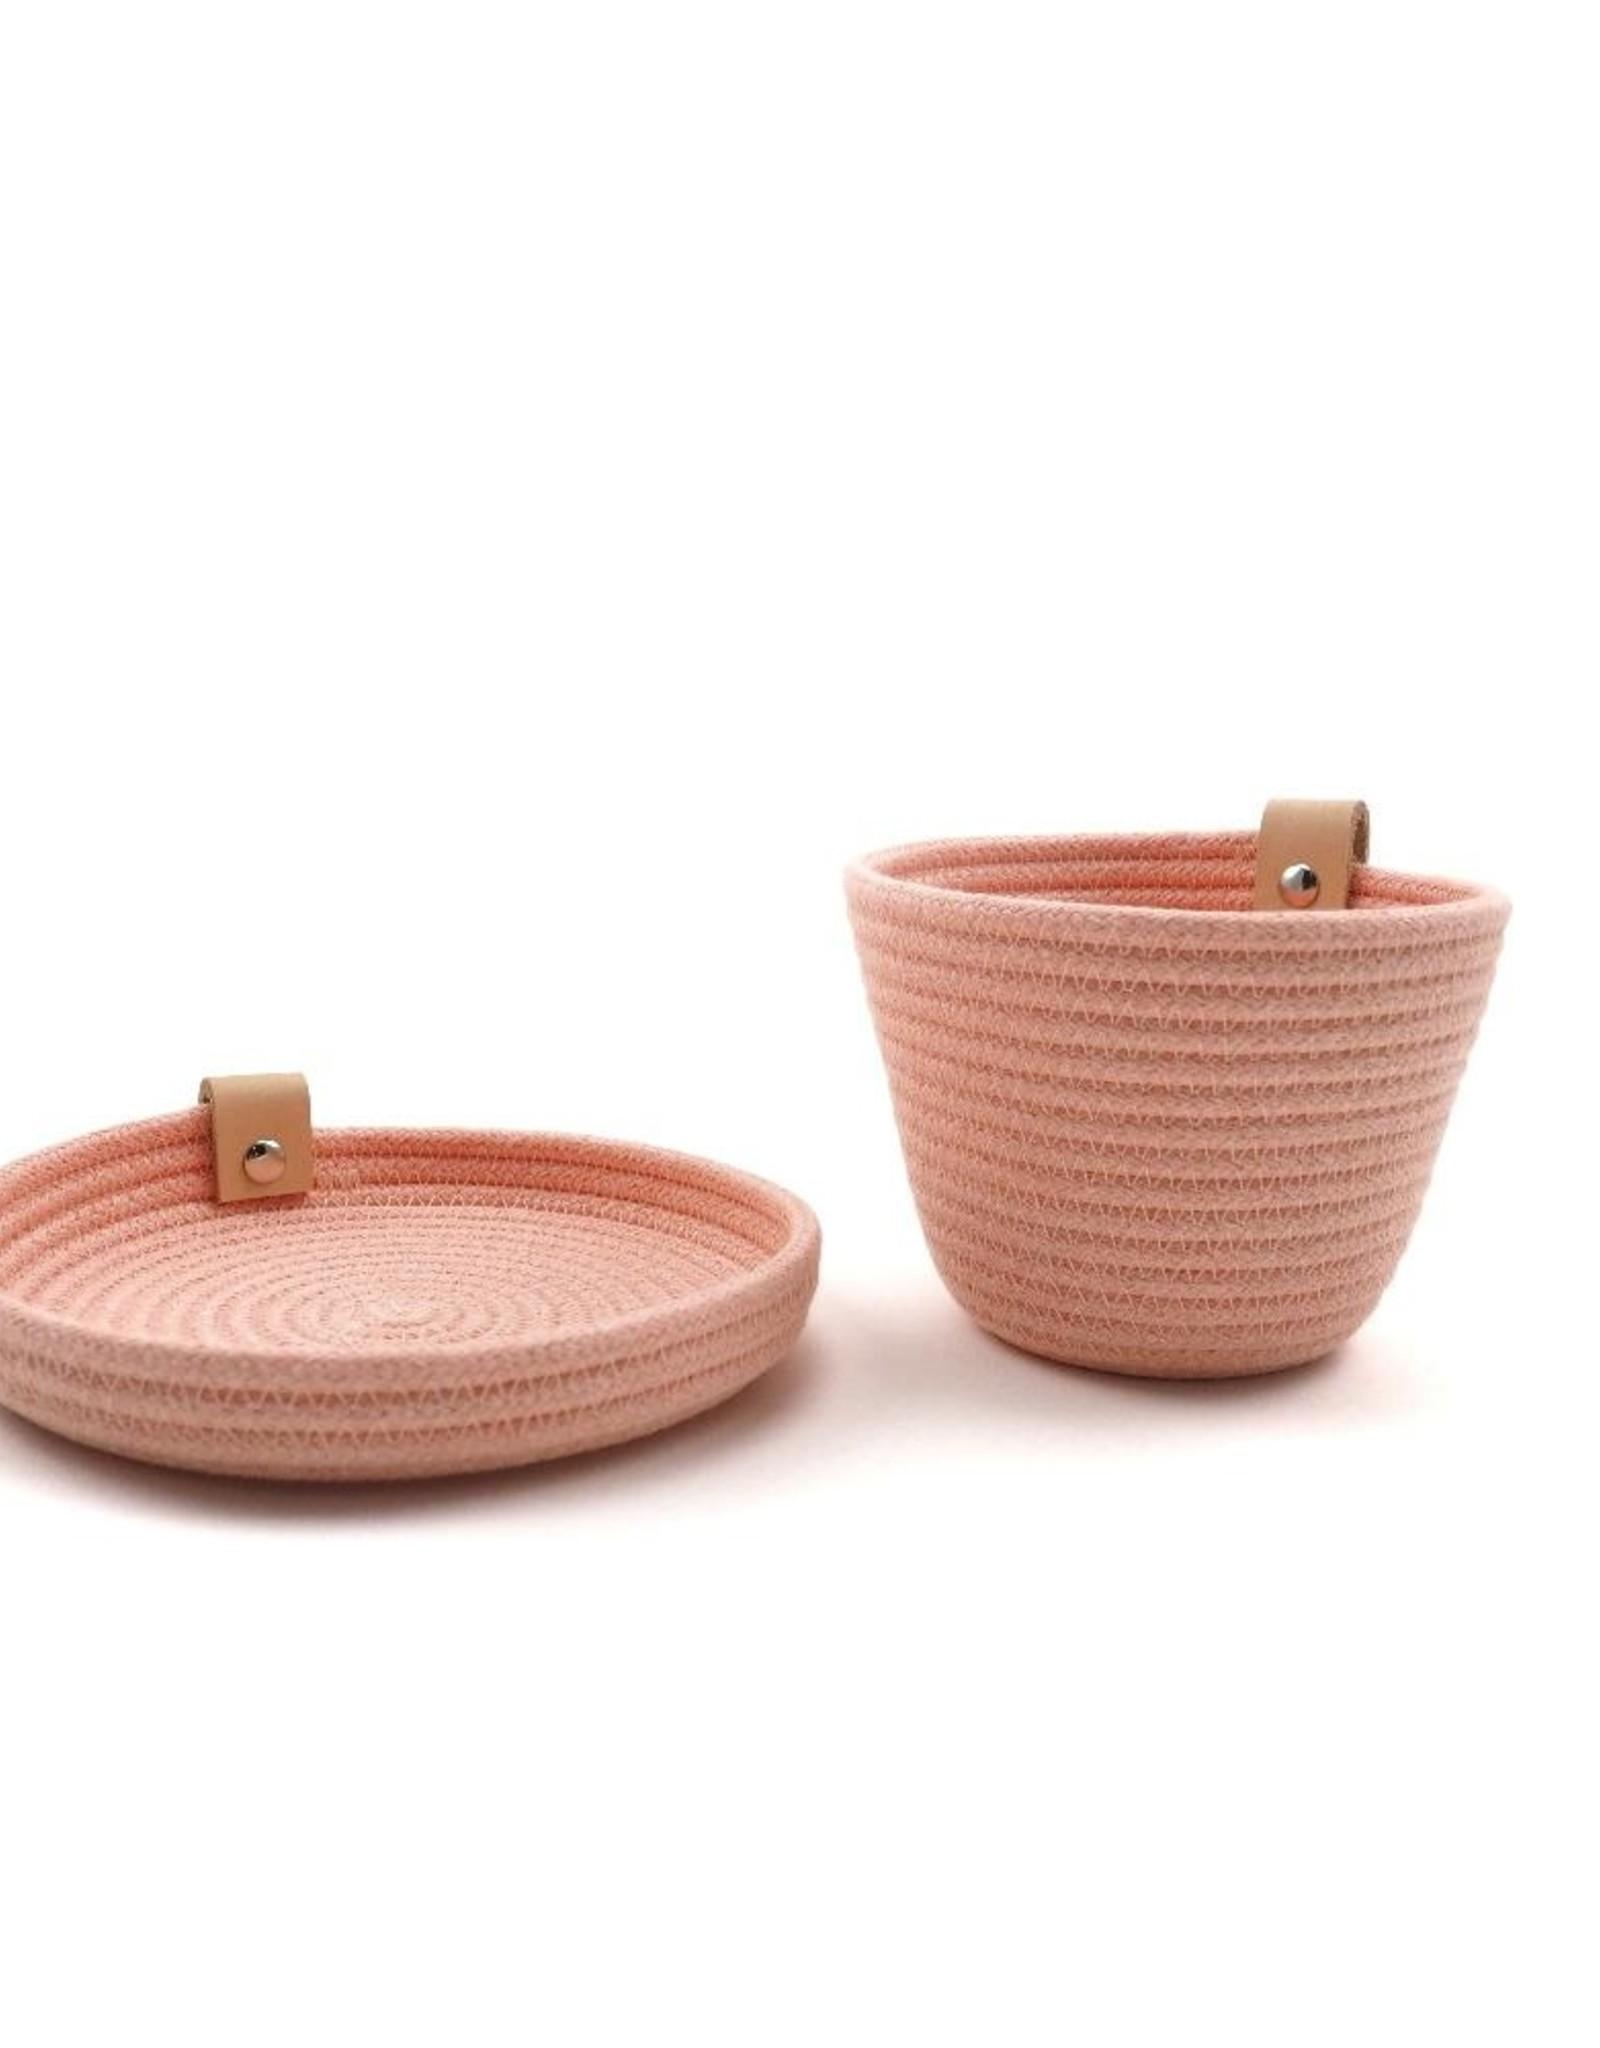 Koba Handmade Mini Bowl High-pastel rose 10x8cm